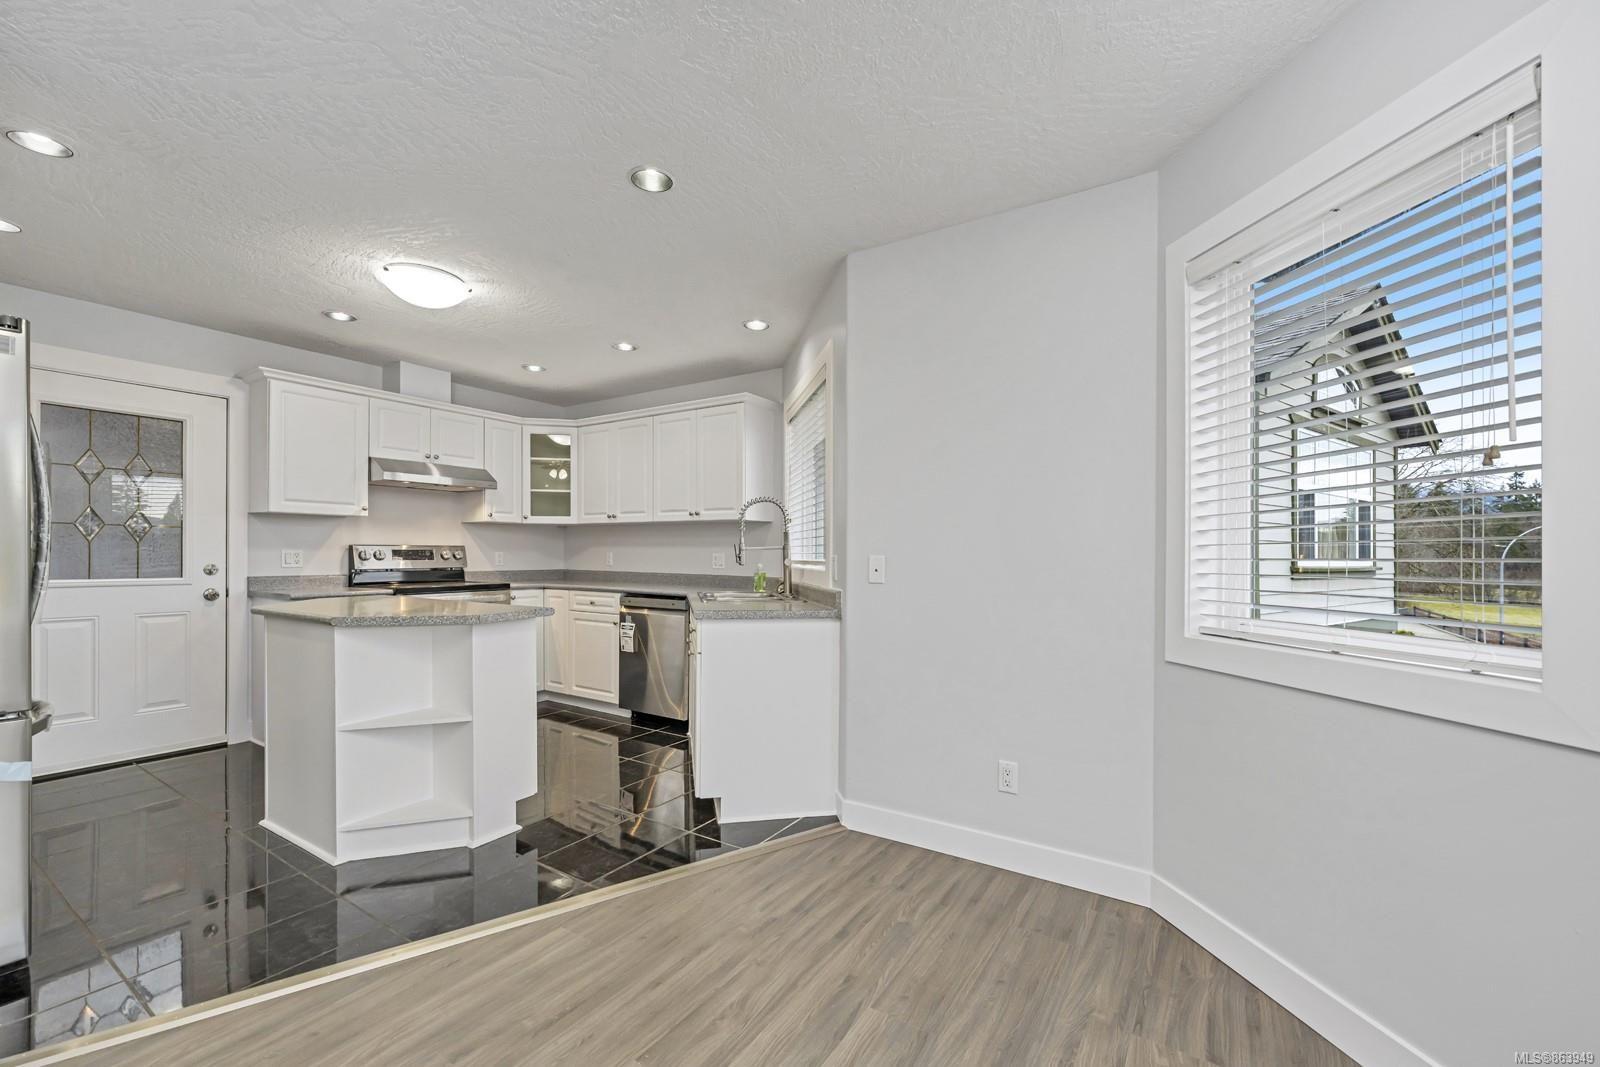 Photo 8: Photos: 6154 Sayward Rd in : Du West Duncan Half Duplex for sale (Duncan)  : MLS®# 863949